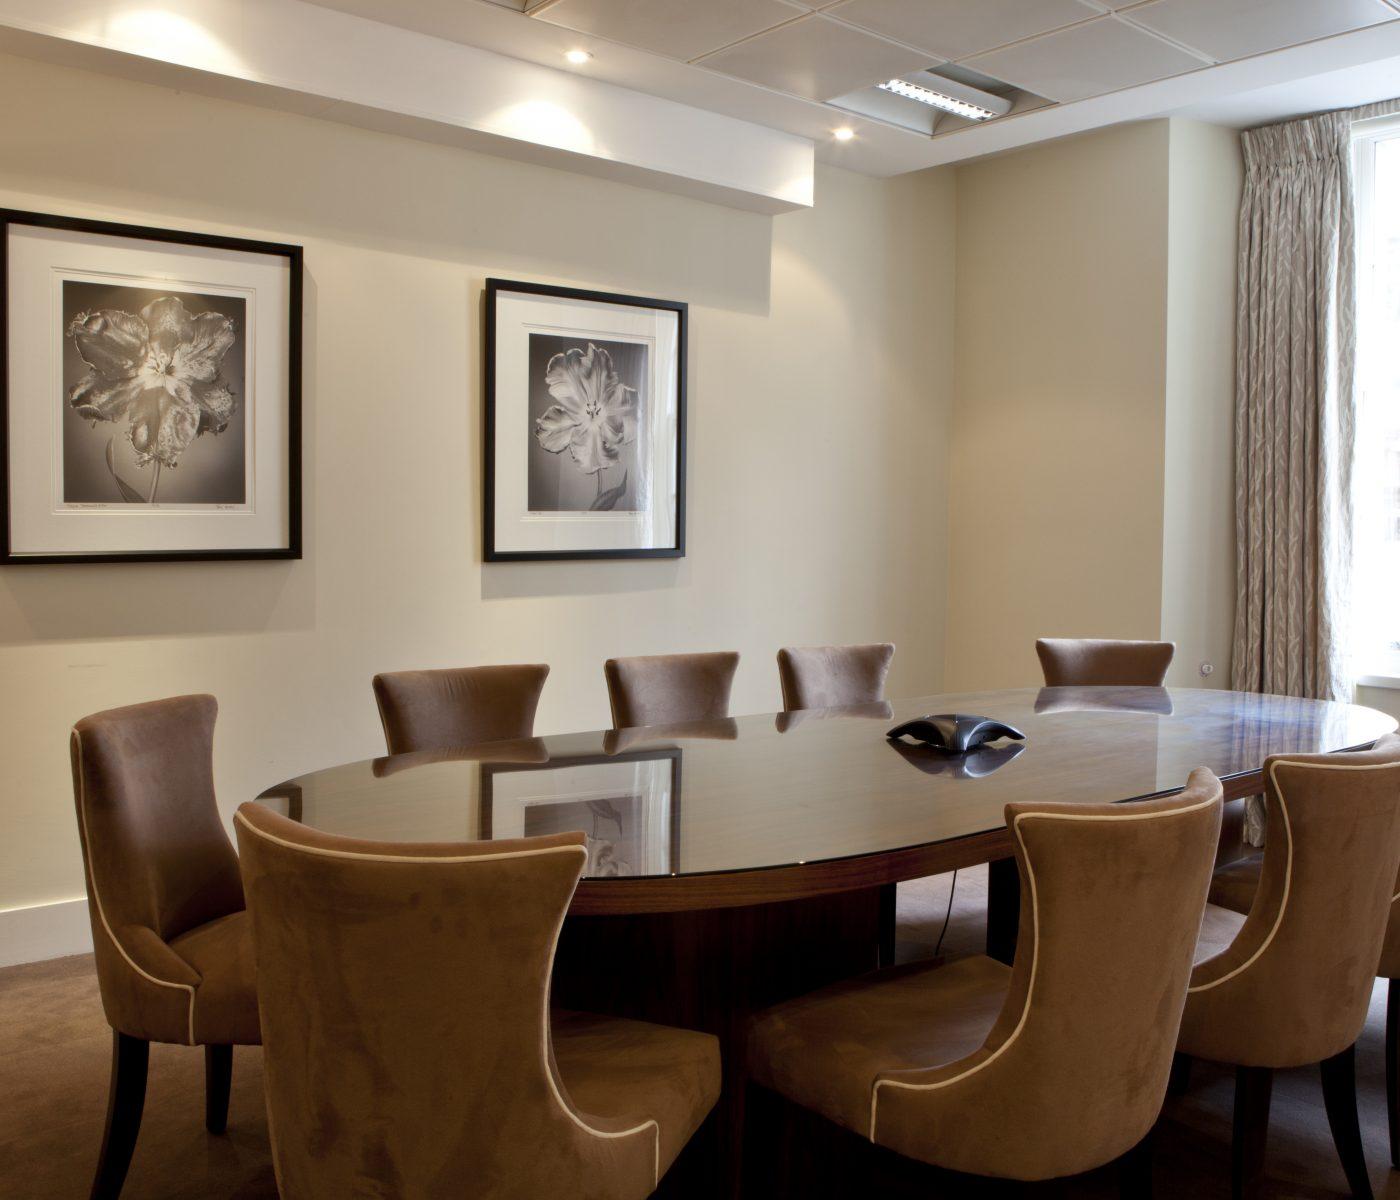 Specialist family law firm in London - Camilla Baldwin